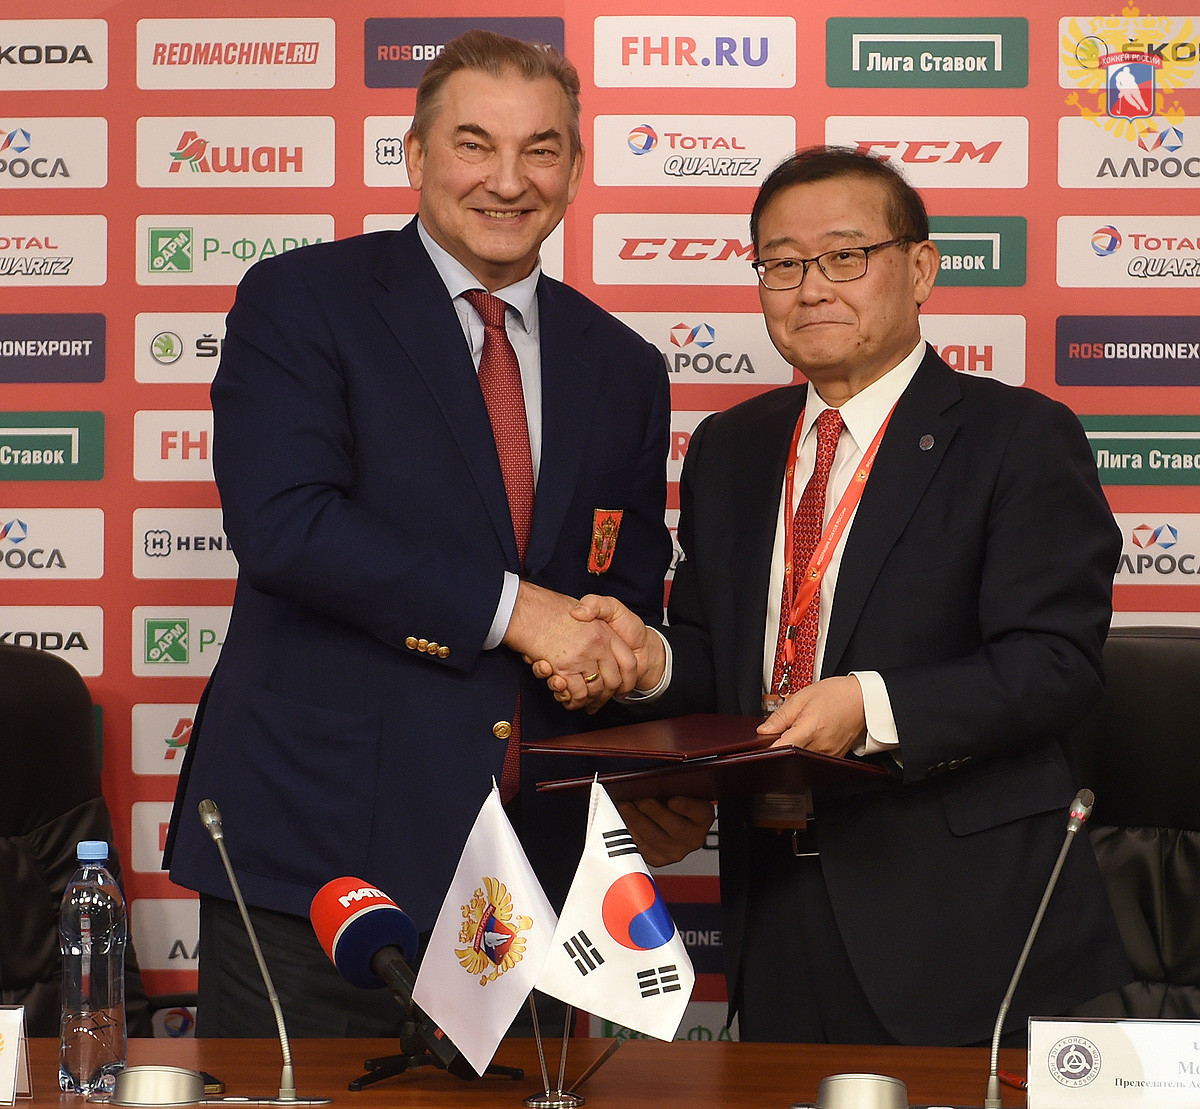 South Korea to face Russia in final Pyeongchang 2018 warm up game